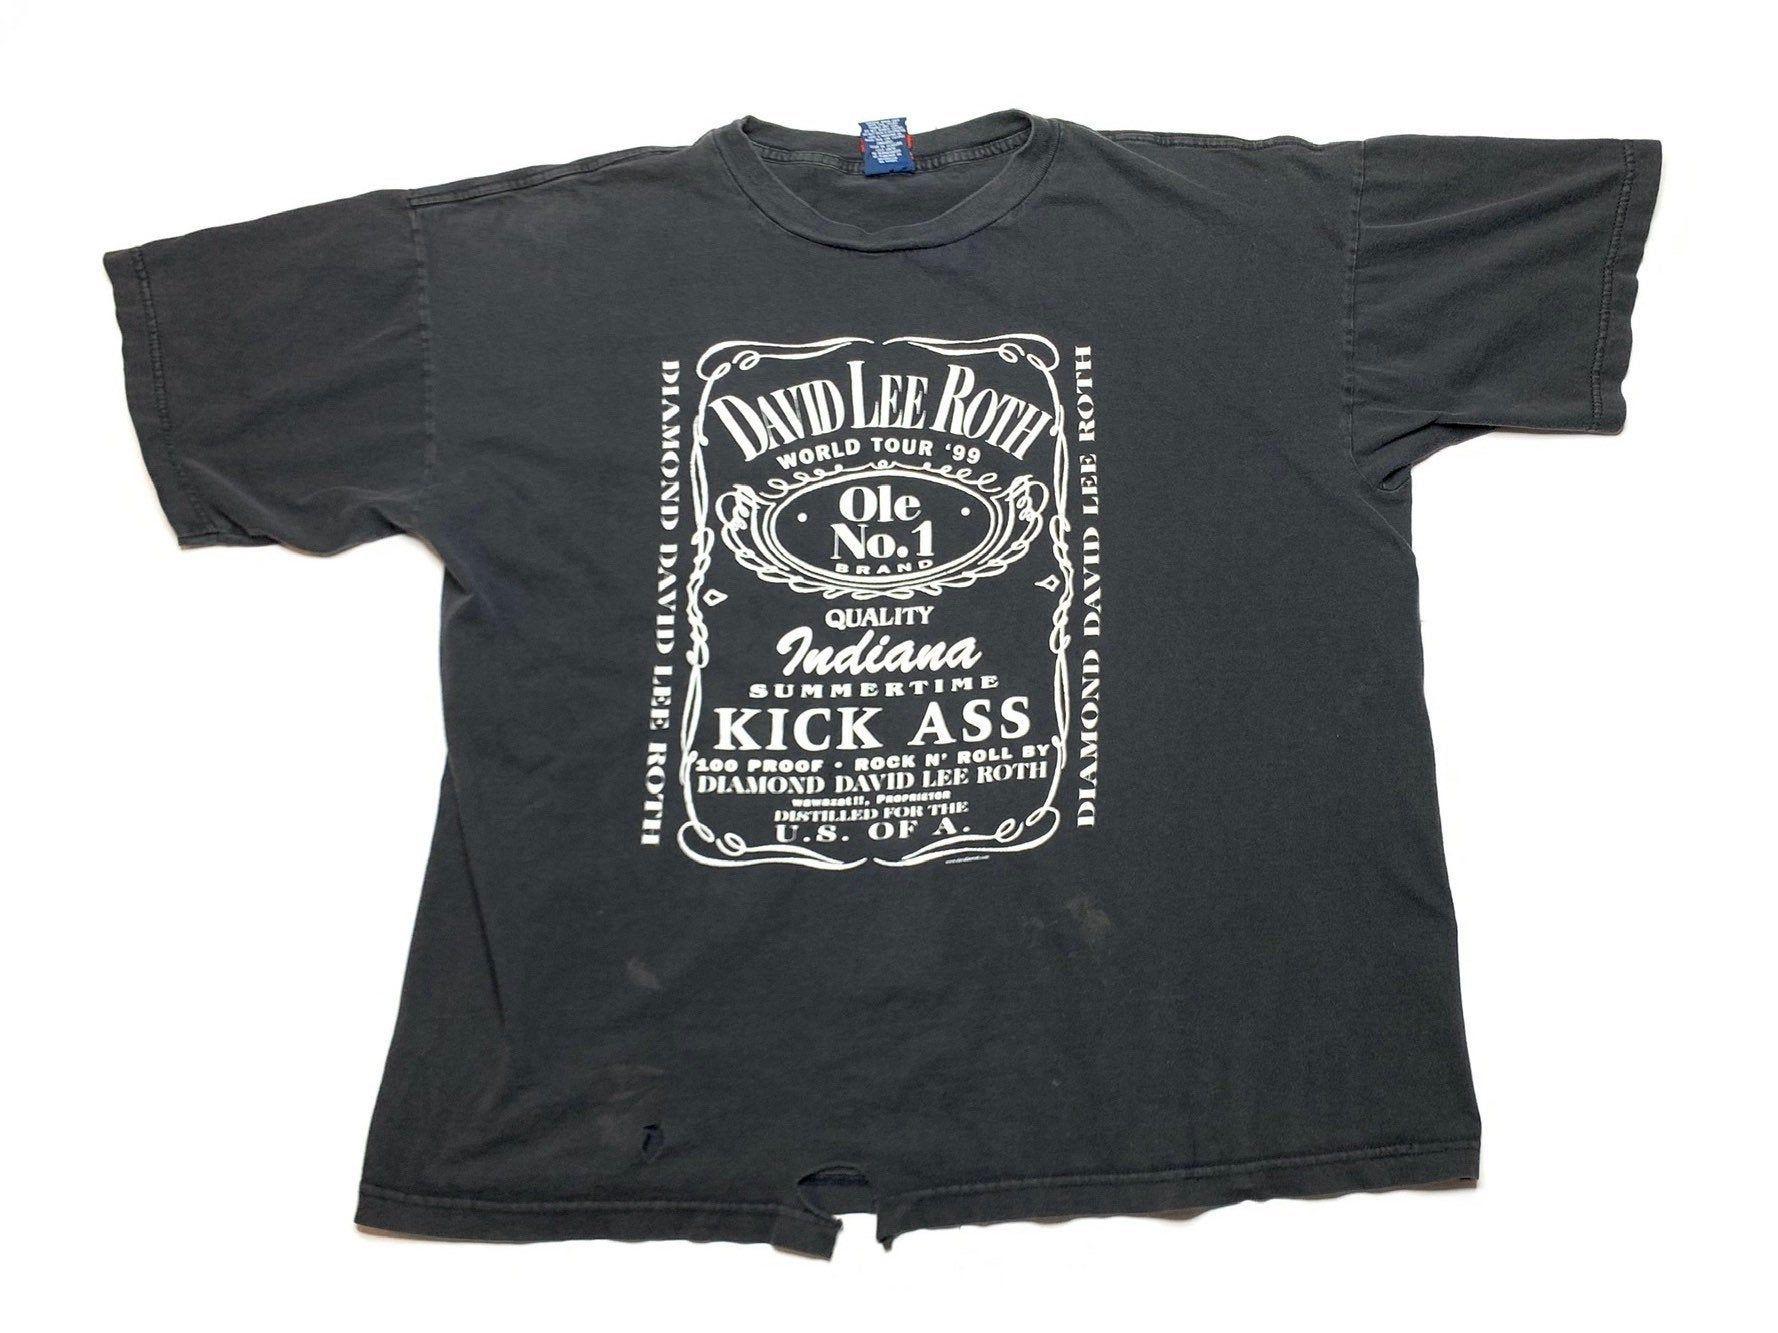 David Lee Roth World Tour Shirt 1999 Vintage Rare Rock Music Tshirt Vtg 90s Van Halen Band Jack Daniels Inspired Logo S In 2020 Music Tshirts Tour Shirt Distressed Tee